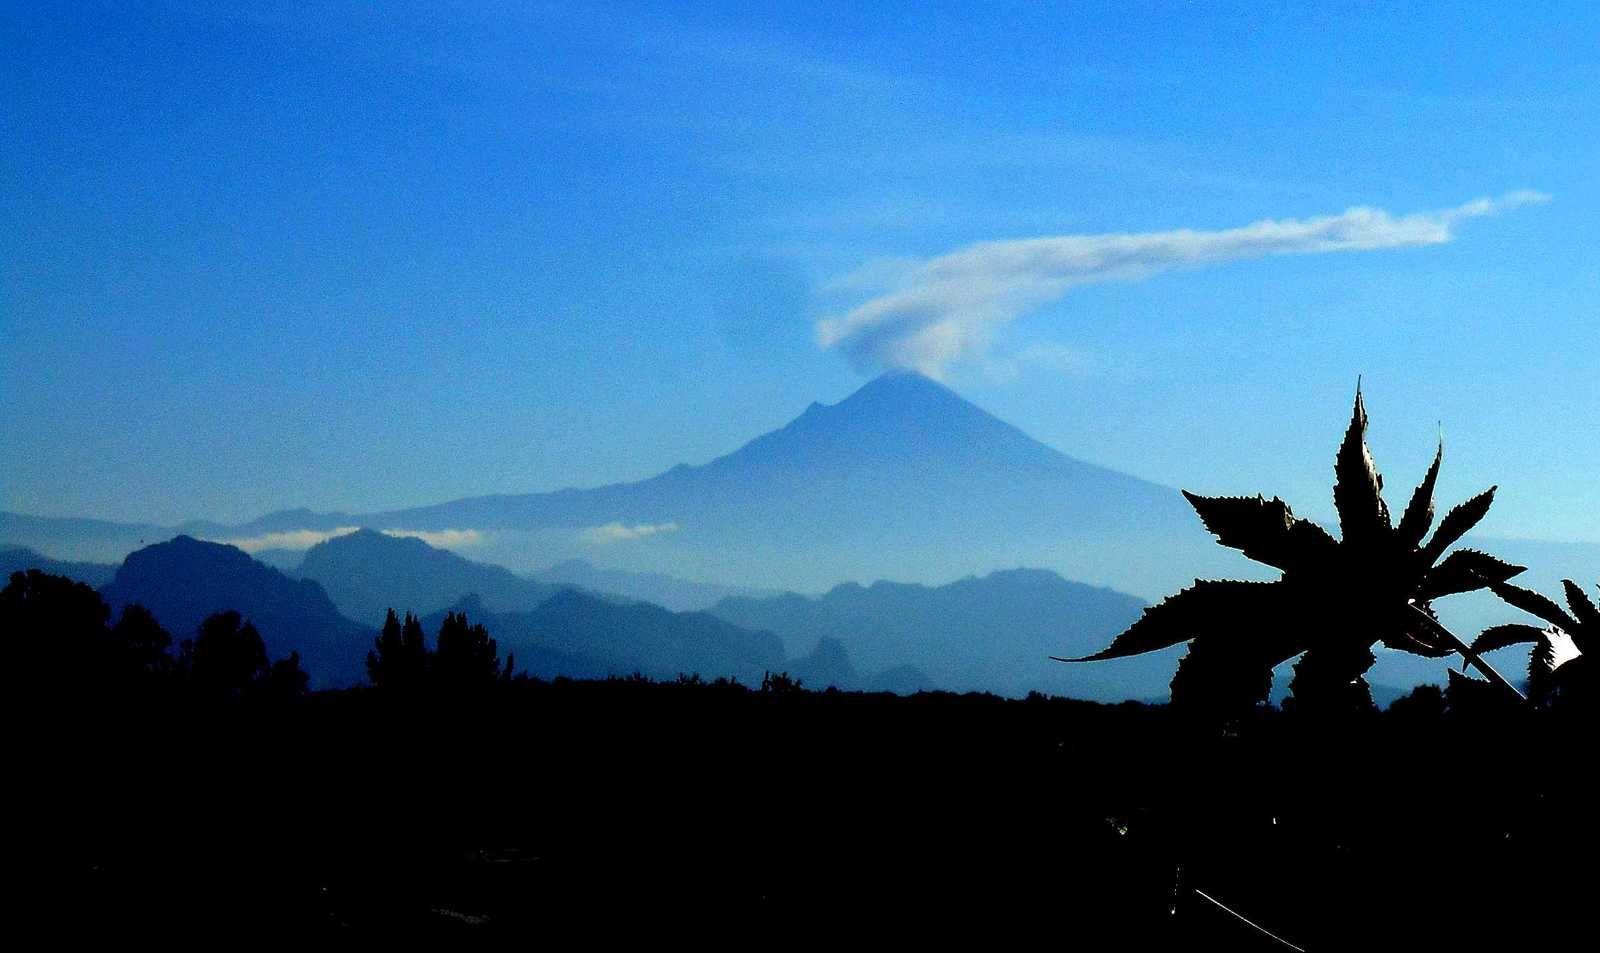 Popocatepetl et  Iztaccíhuatl : volcans de légende